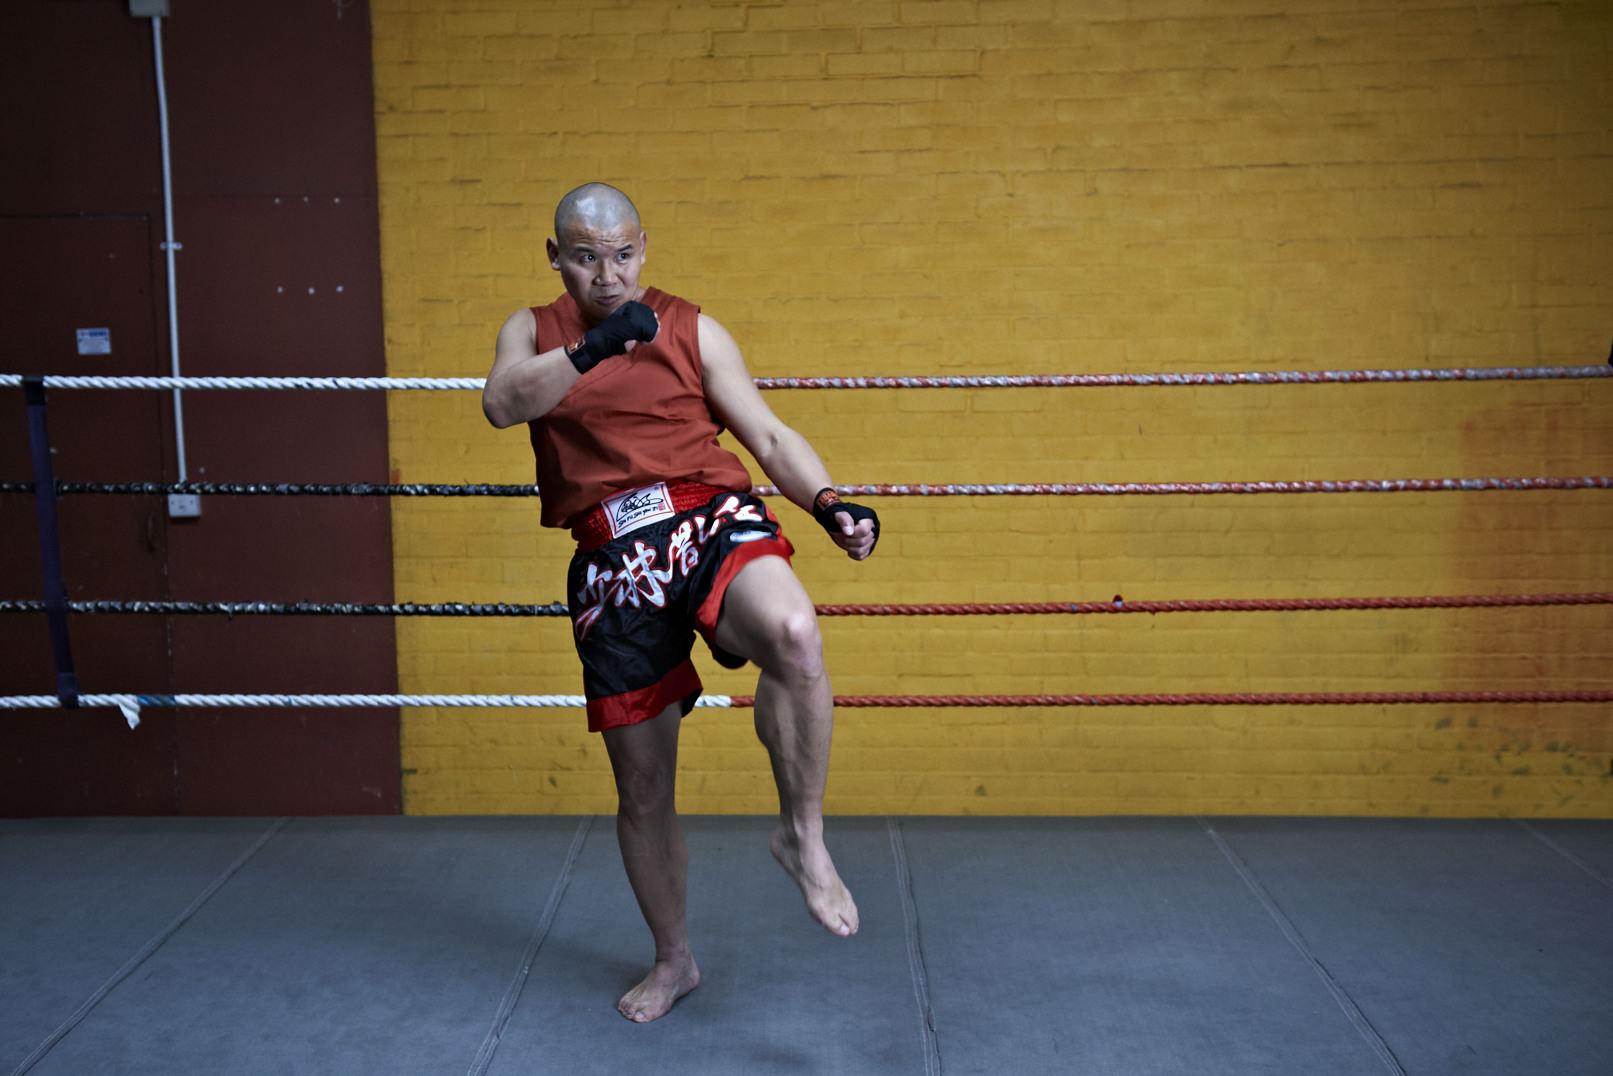 Shaolin temple uk shifu yanzi kick 18.jpg